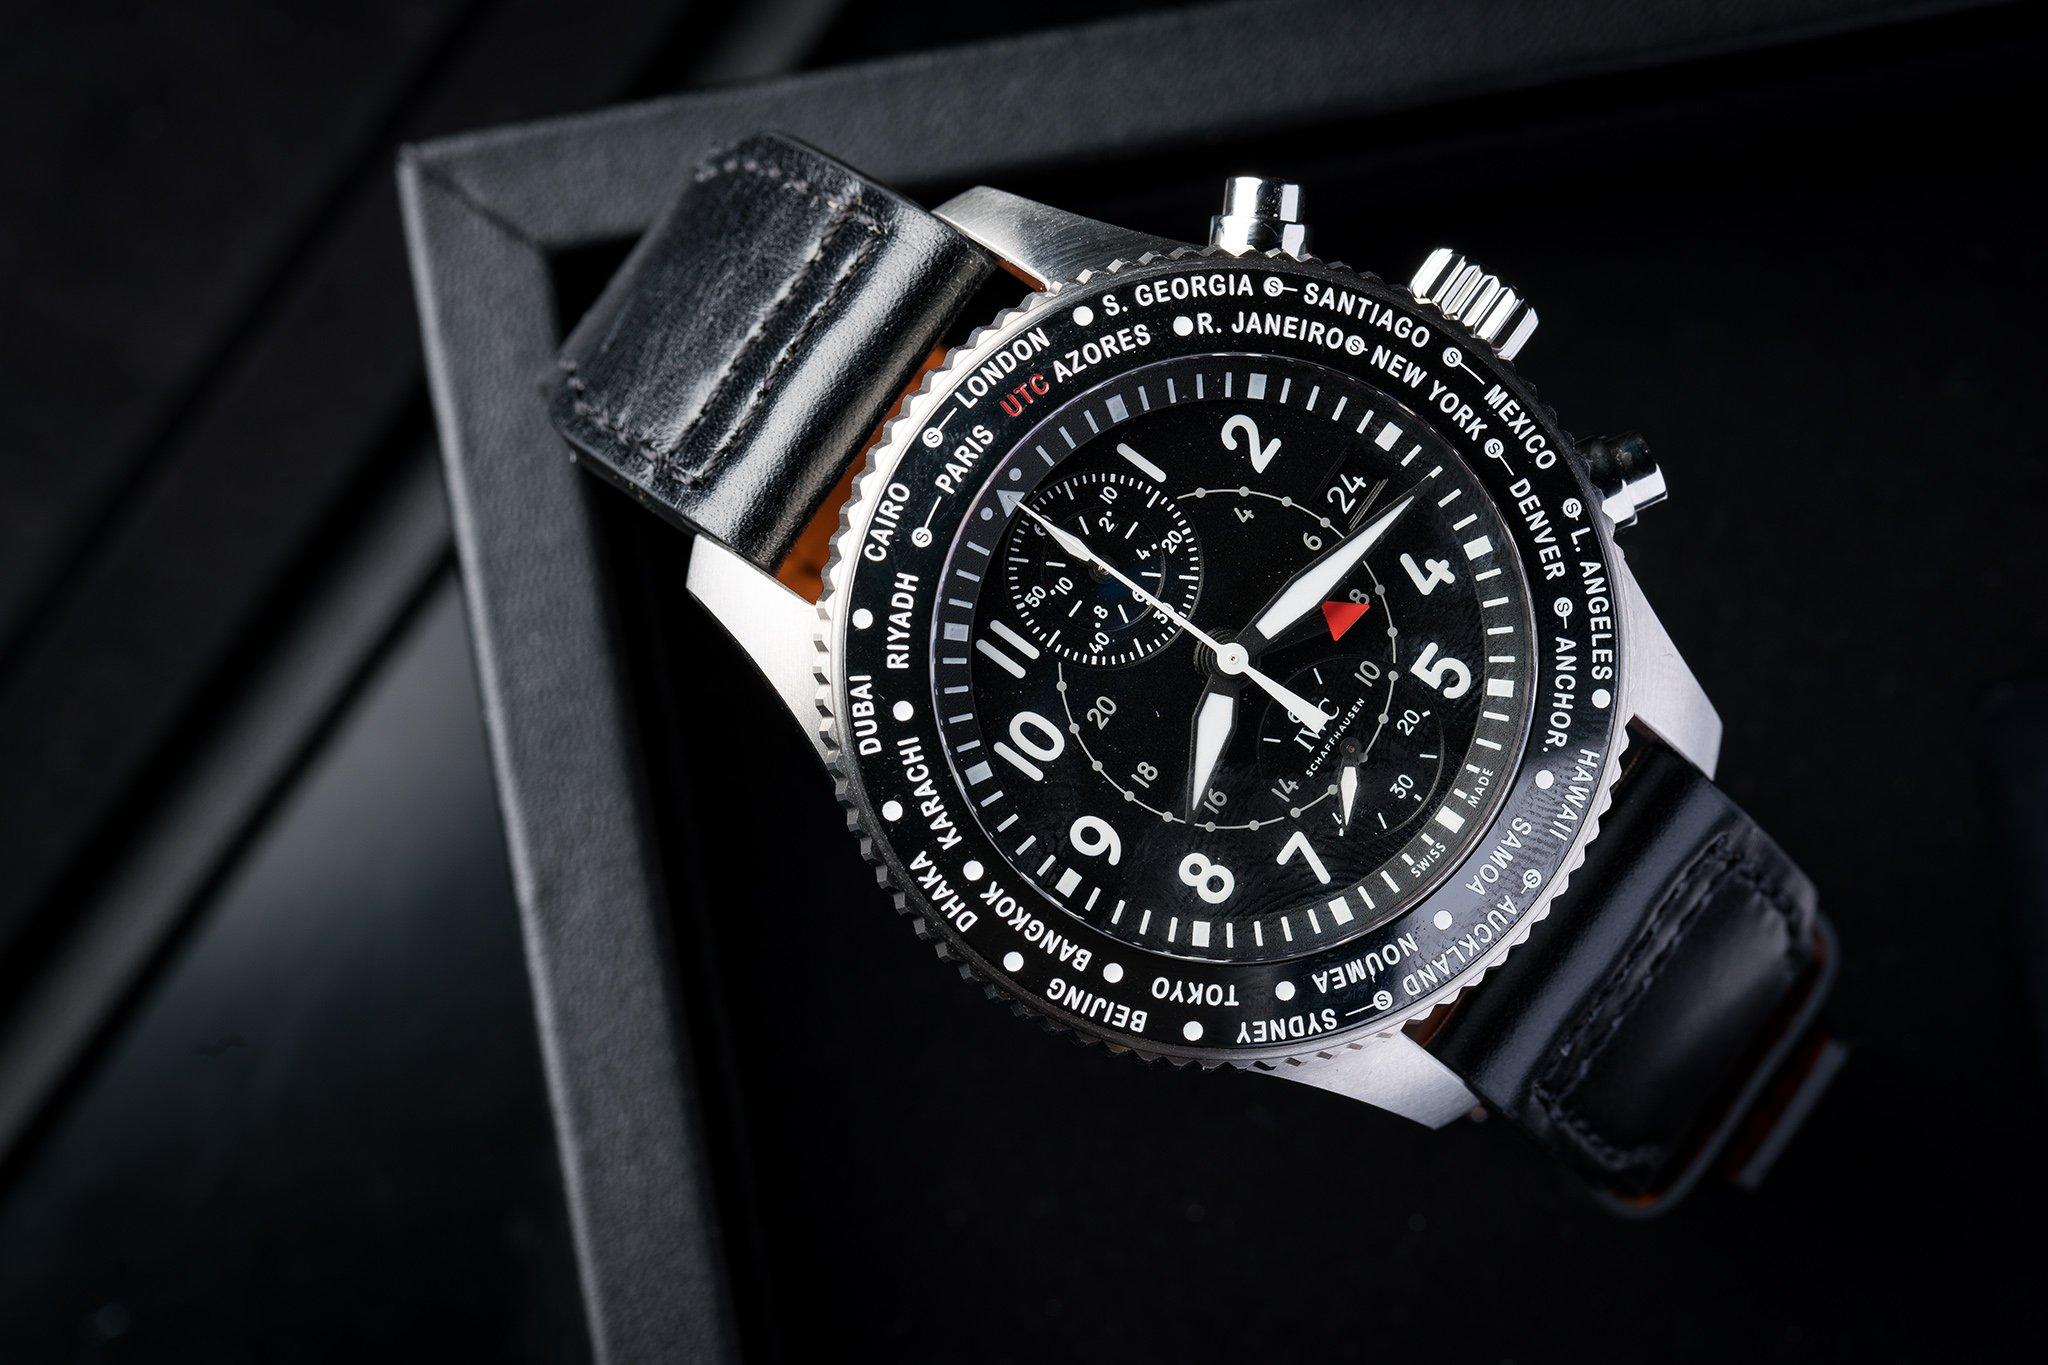 Replica-IWC-Pilots-Watch-Timezoner-Chronograph